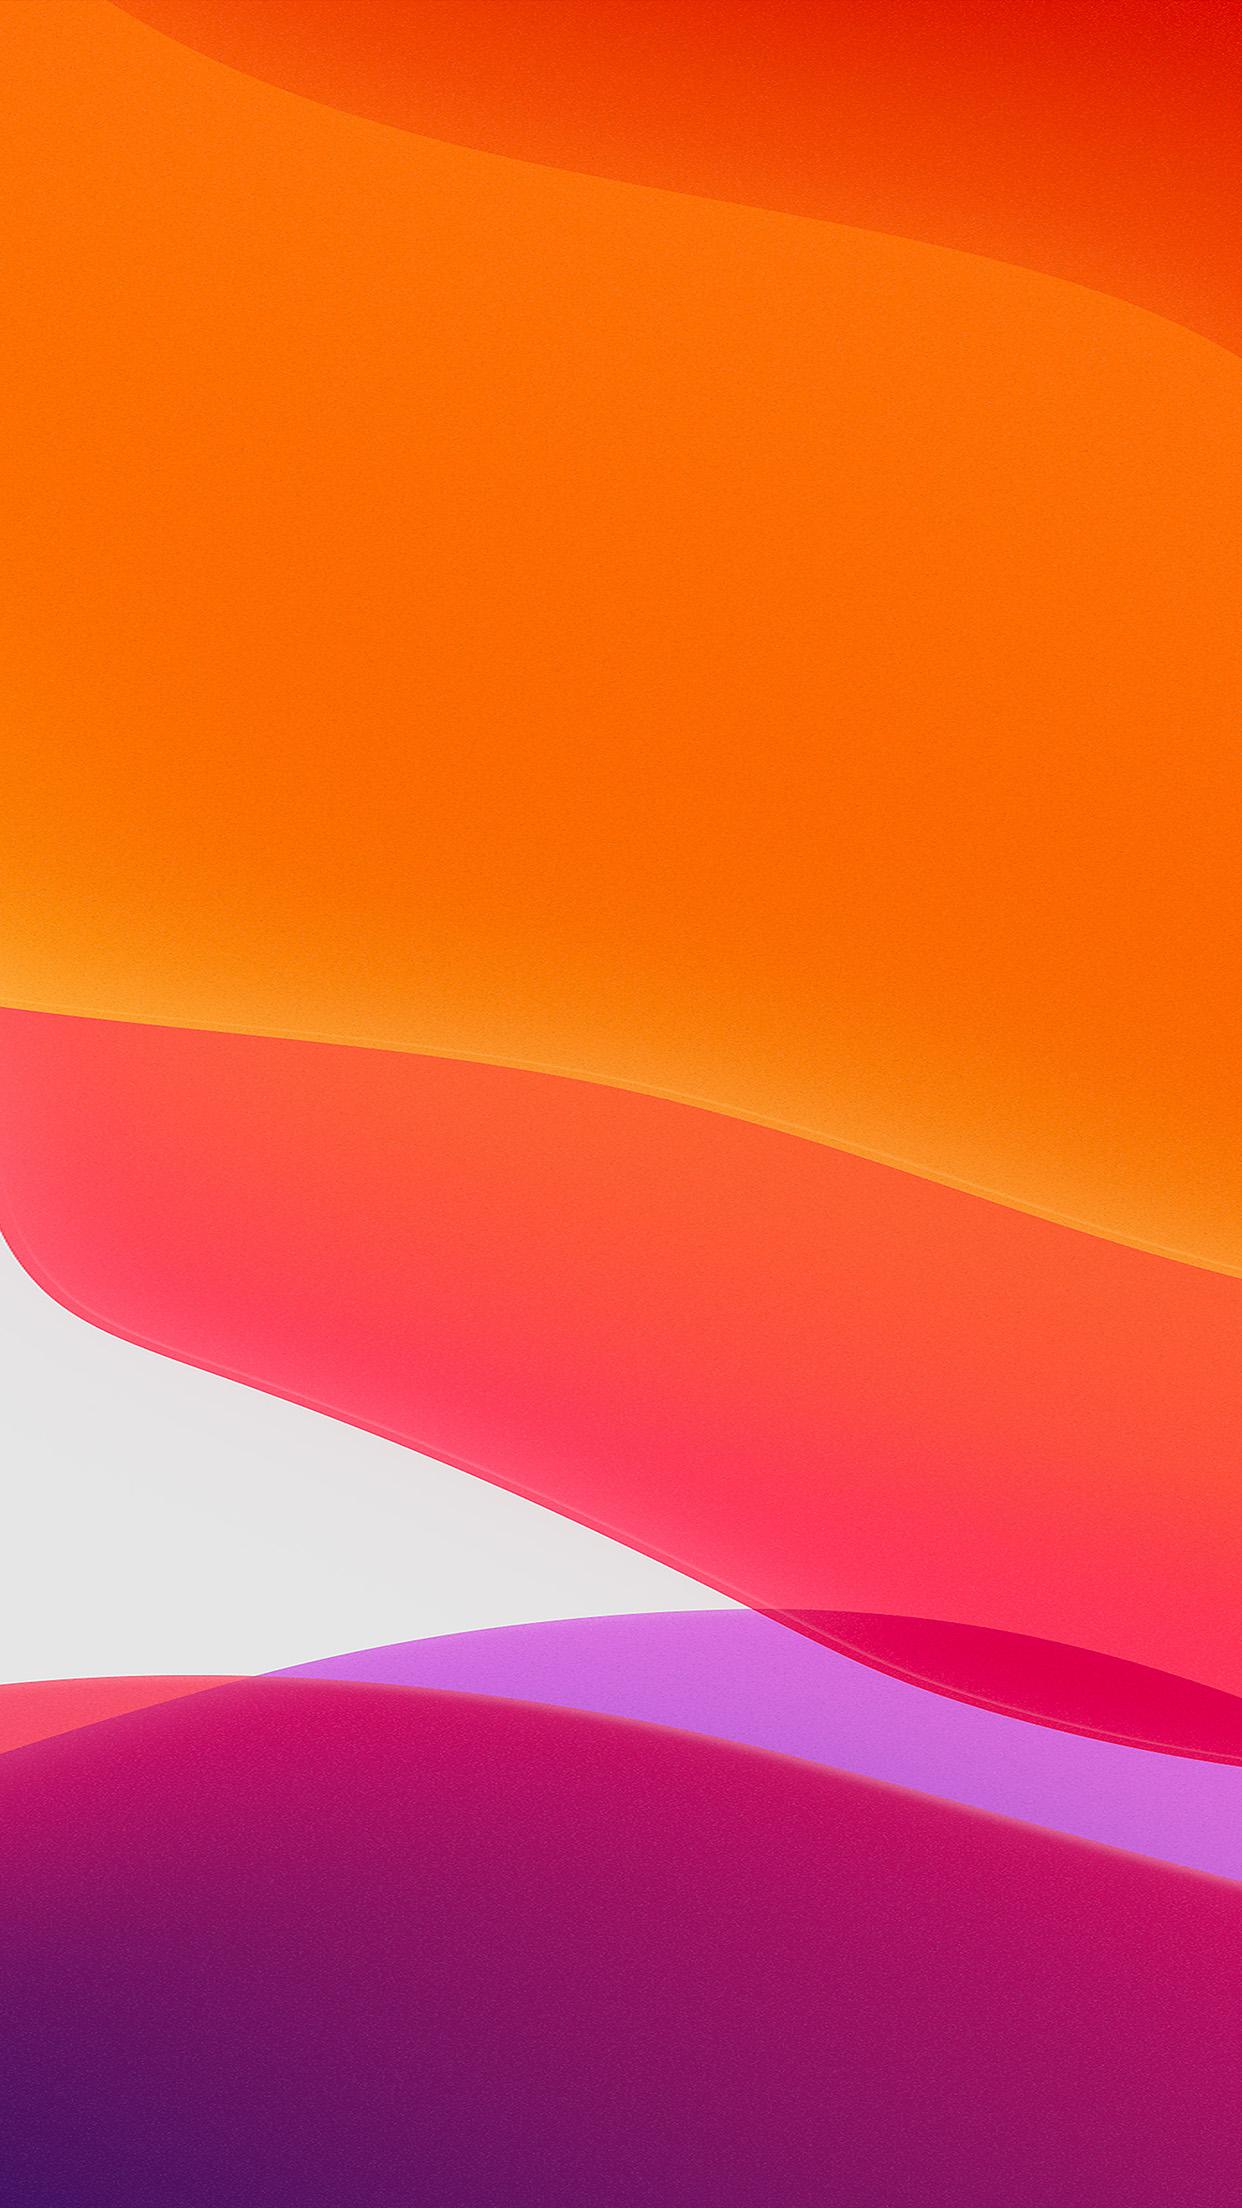 papers.co bj42 apple iphone ios13 background orange art 34 iphone6 plus wallpaper